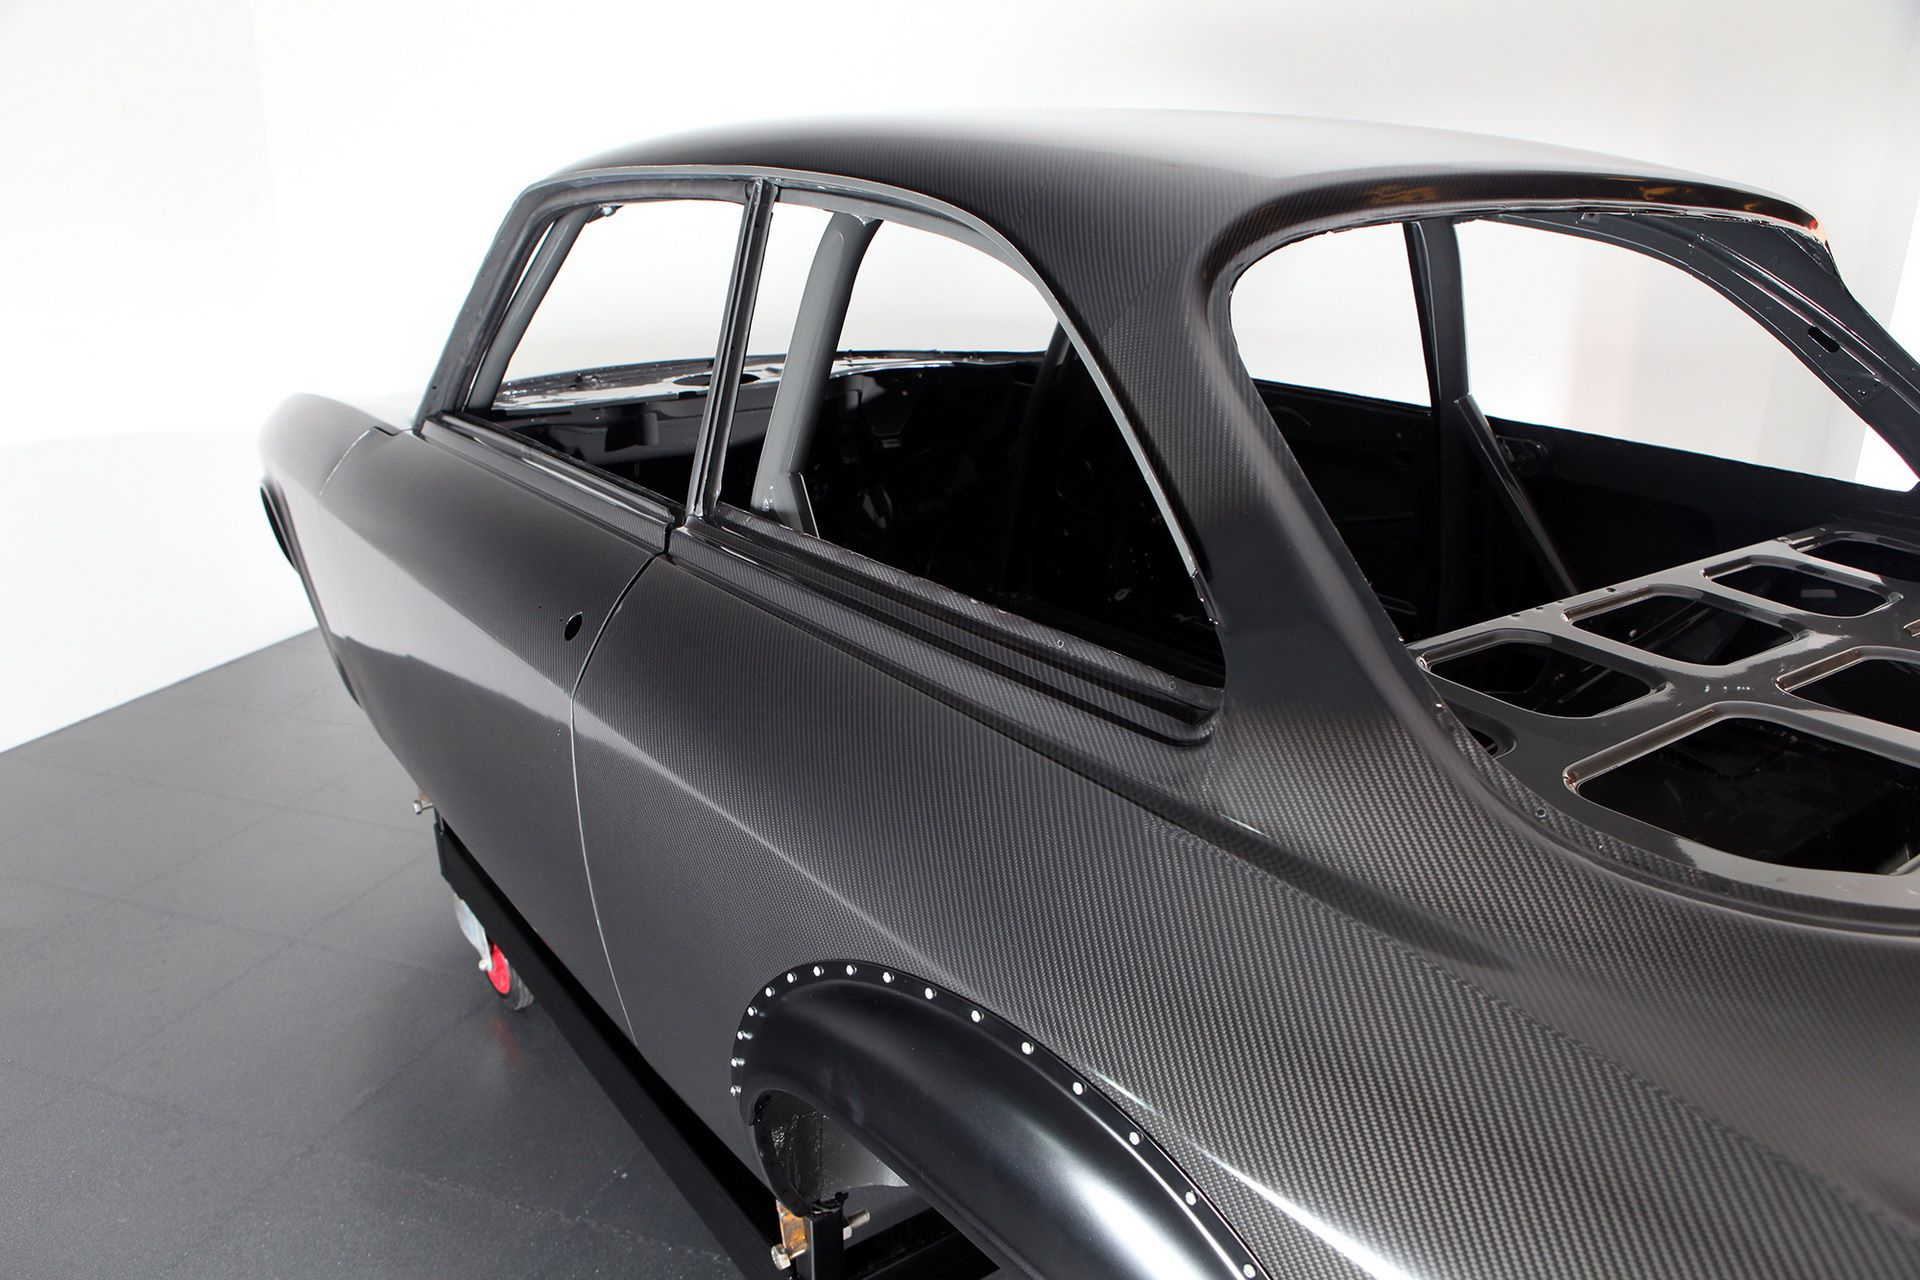 Carbon-Alfa-Romeo-Giulia-by-Alfaholics-4